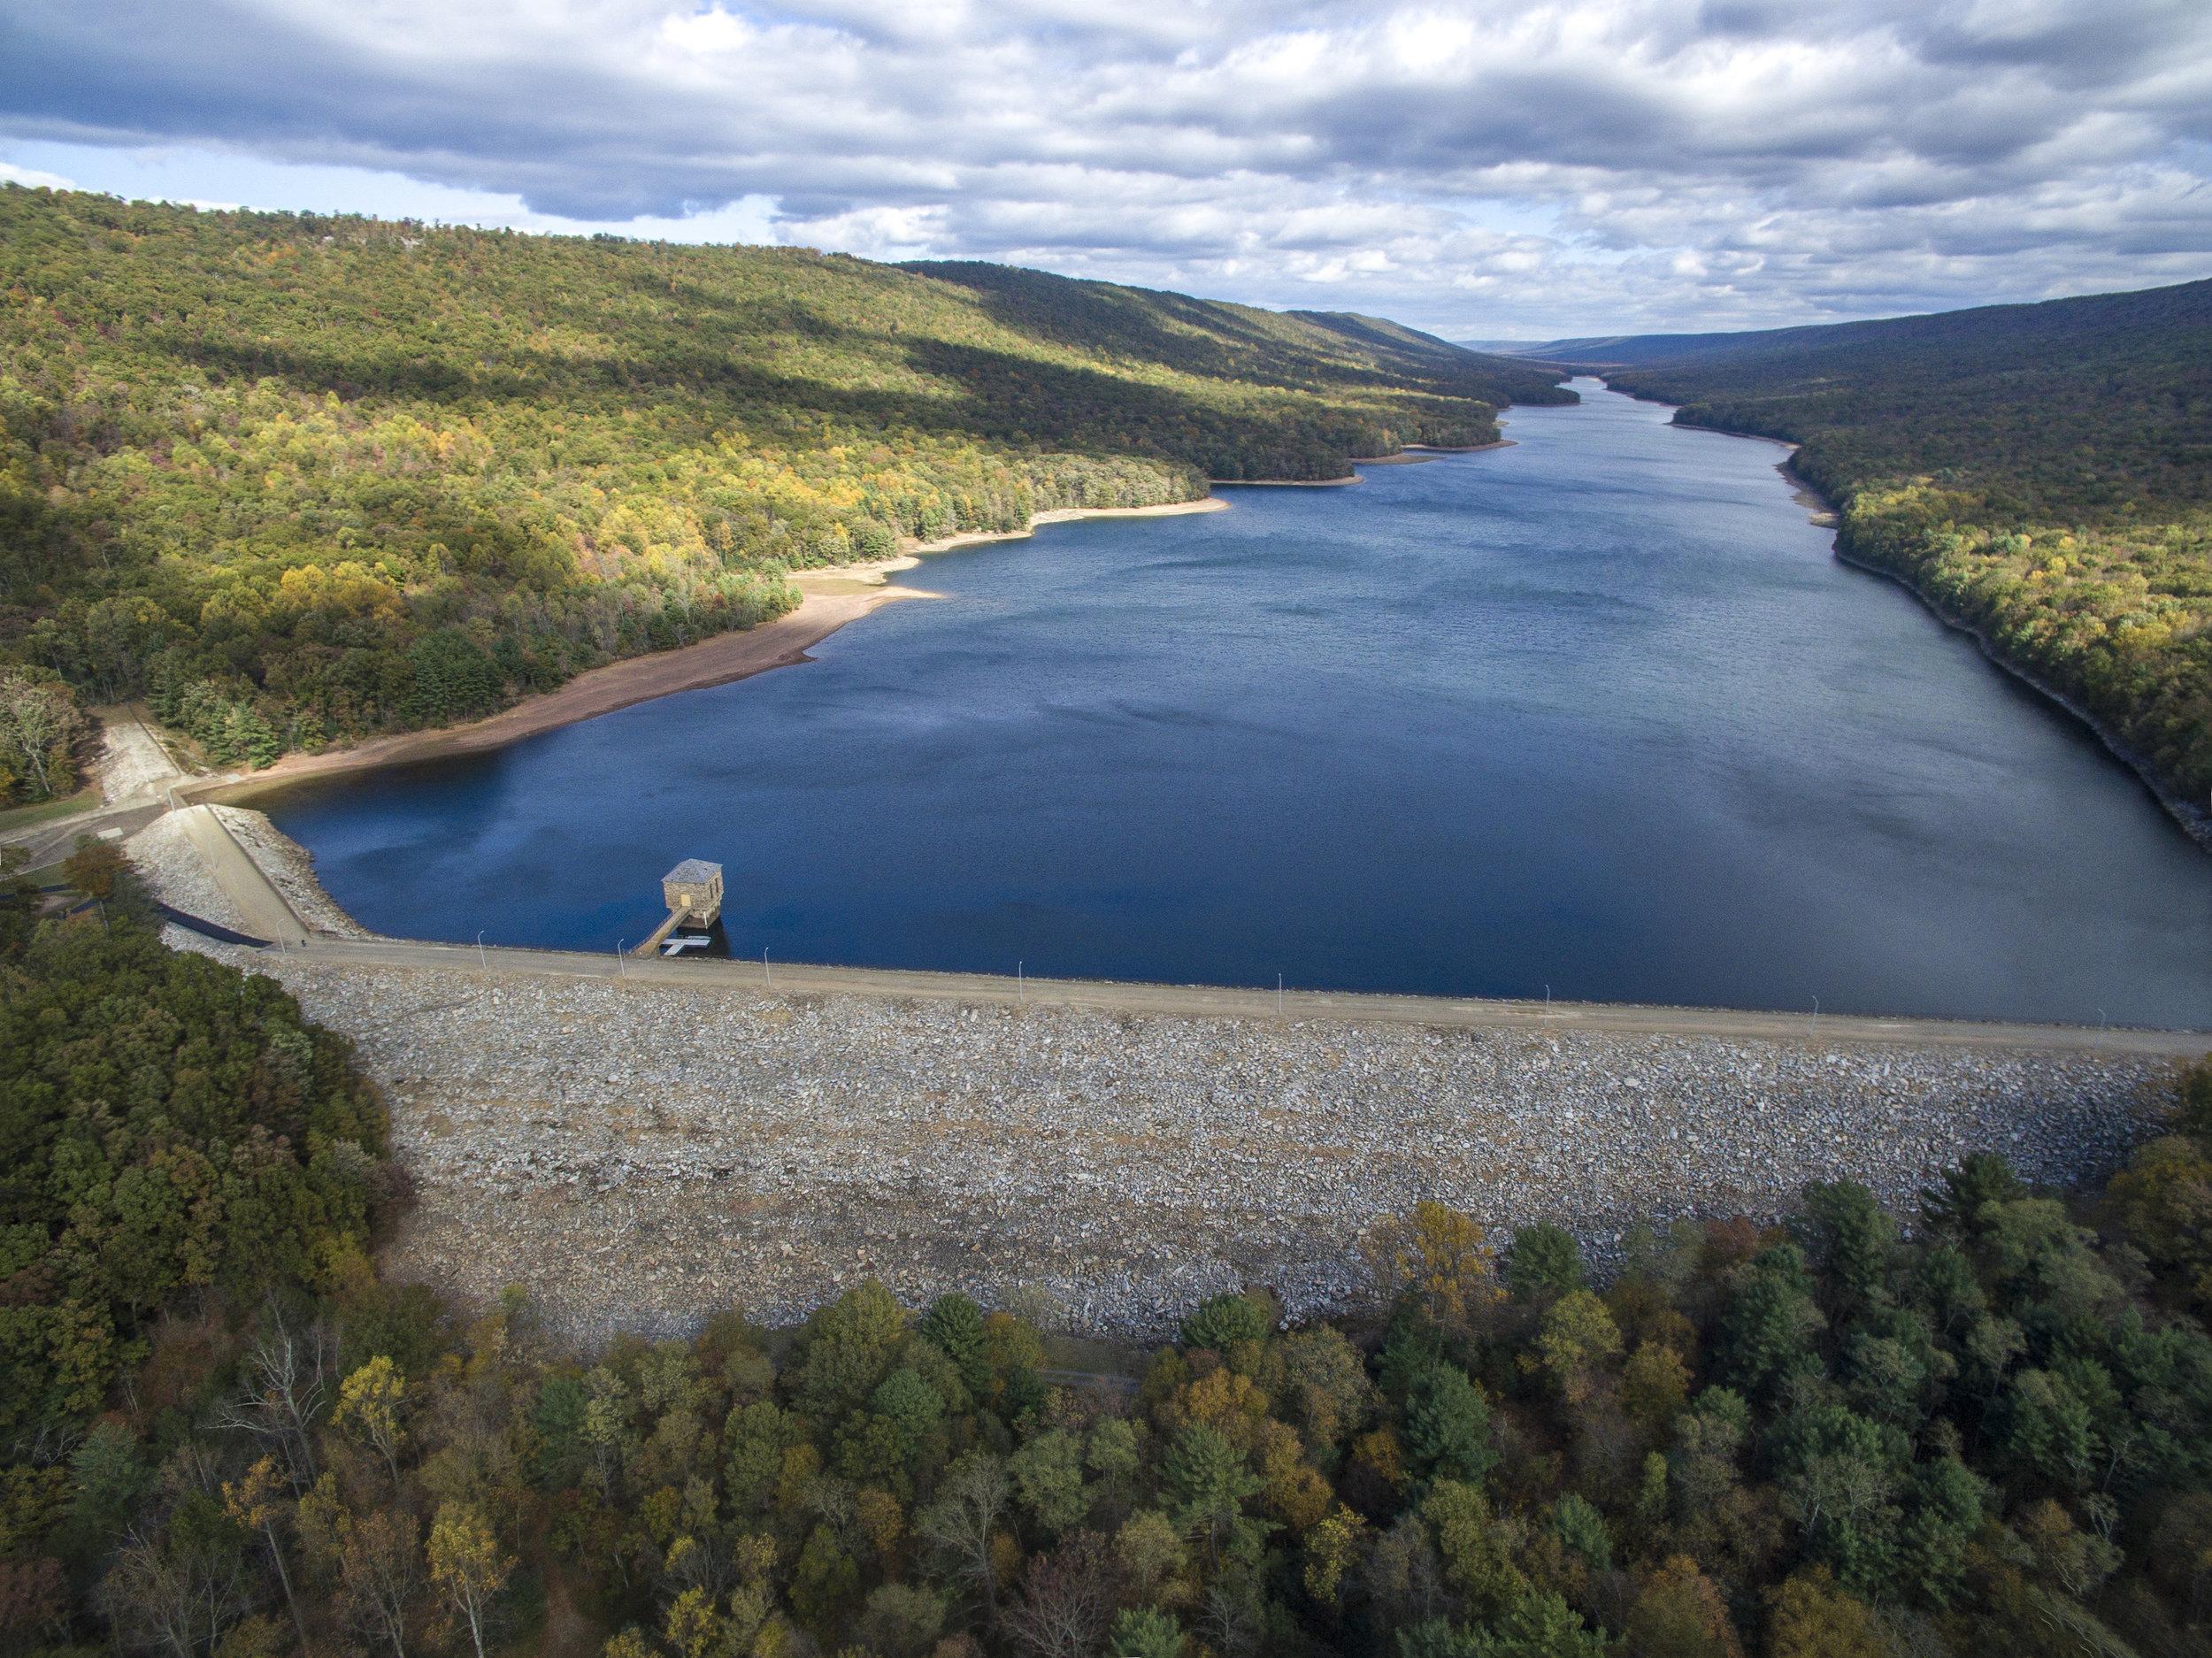 DeHart Dam & Reservoir (courtesy Capital Region Water)